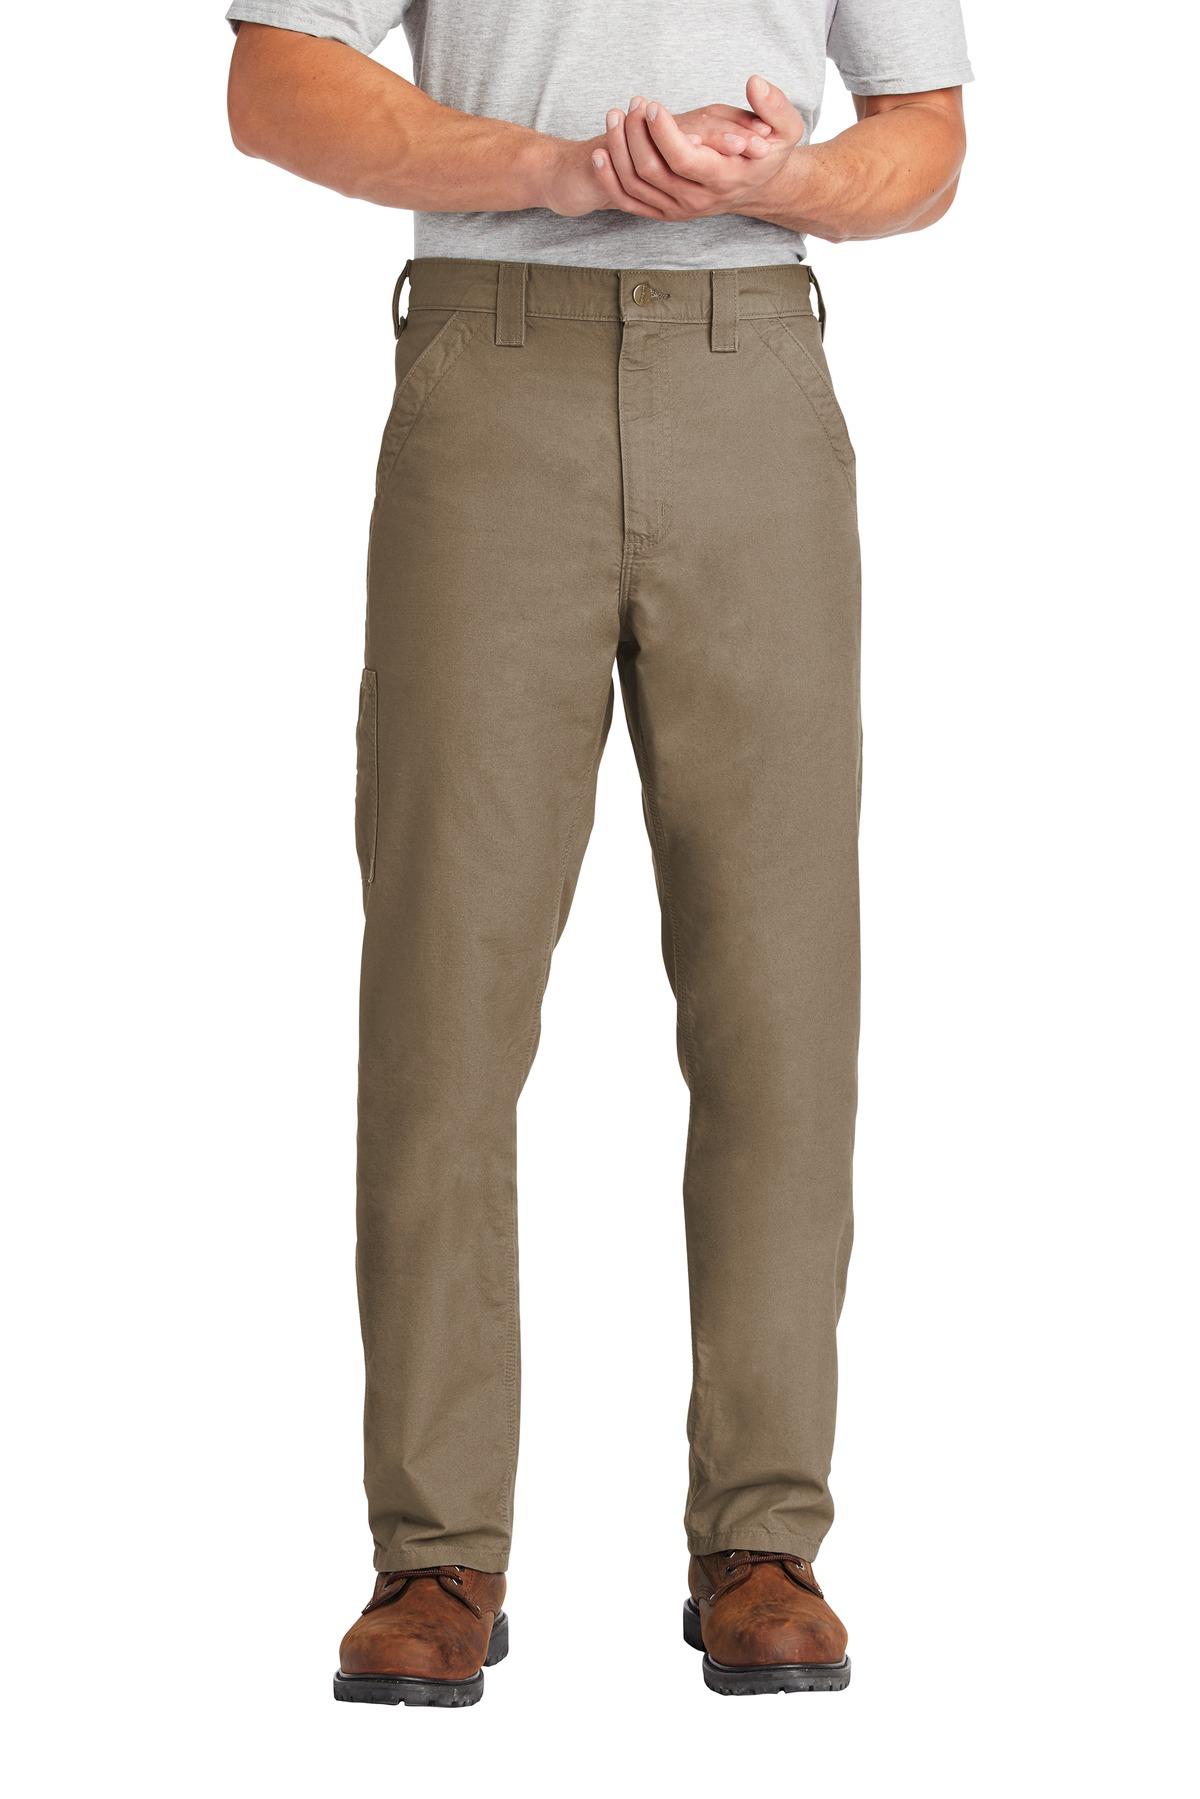 B151 Carhartt Men/'s 100/% Cotton Canvas Work Dungaree Pant Tan /& Dark Khaki